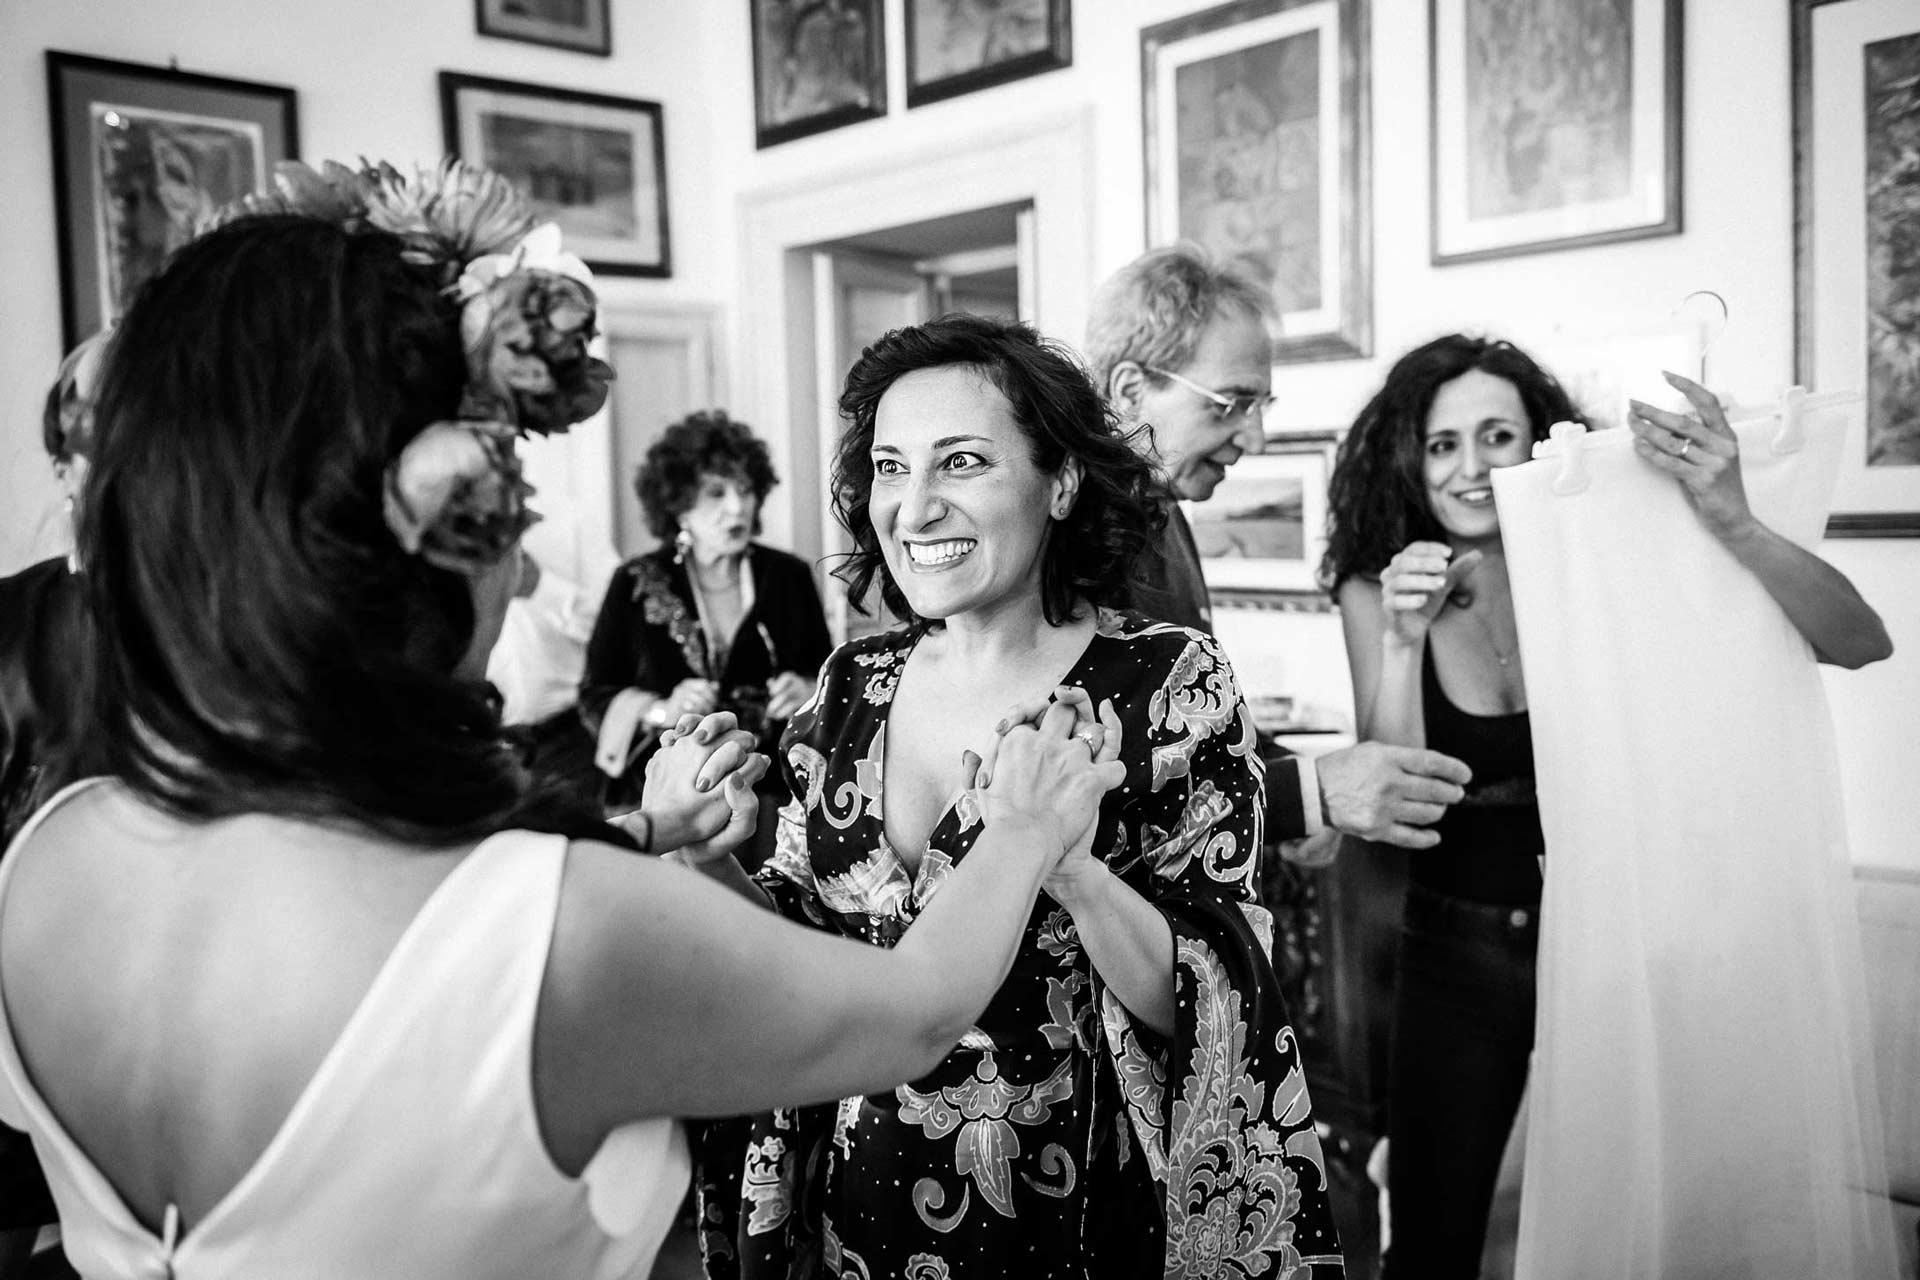 Fotografo-Matrimonio-Stile-Reportage-Simone-Nunzi